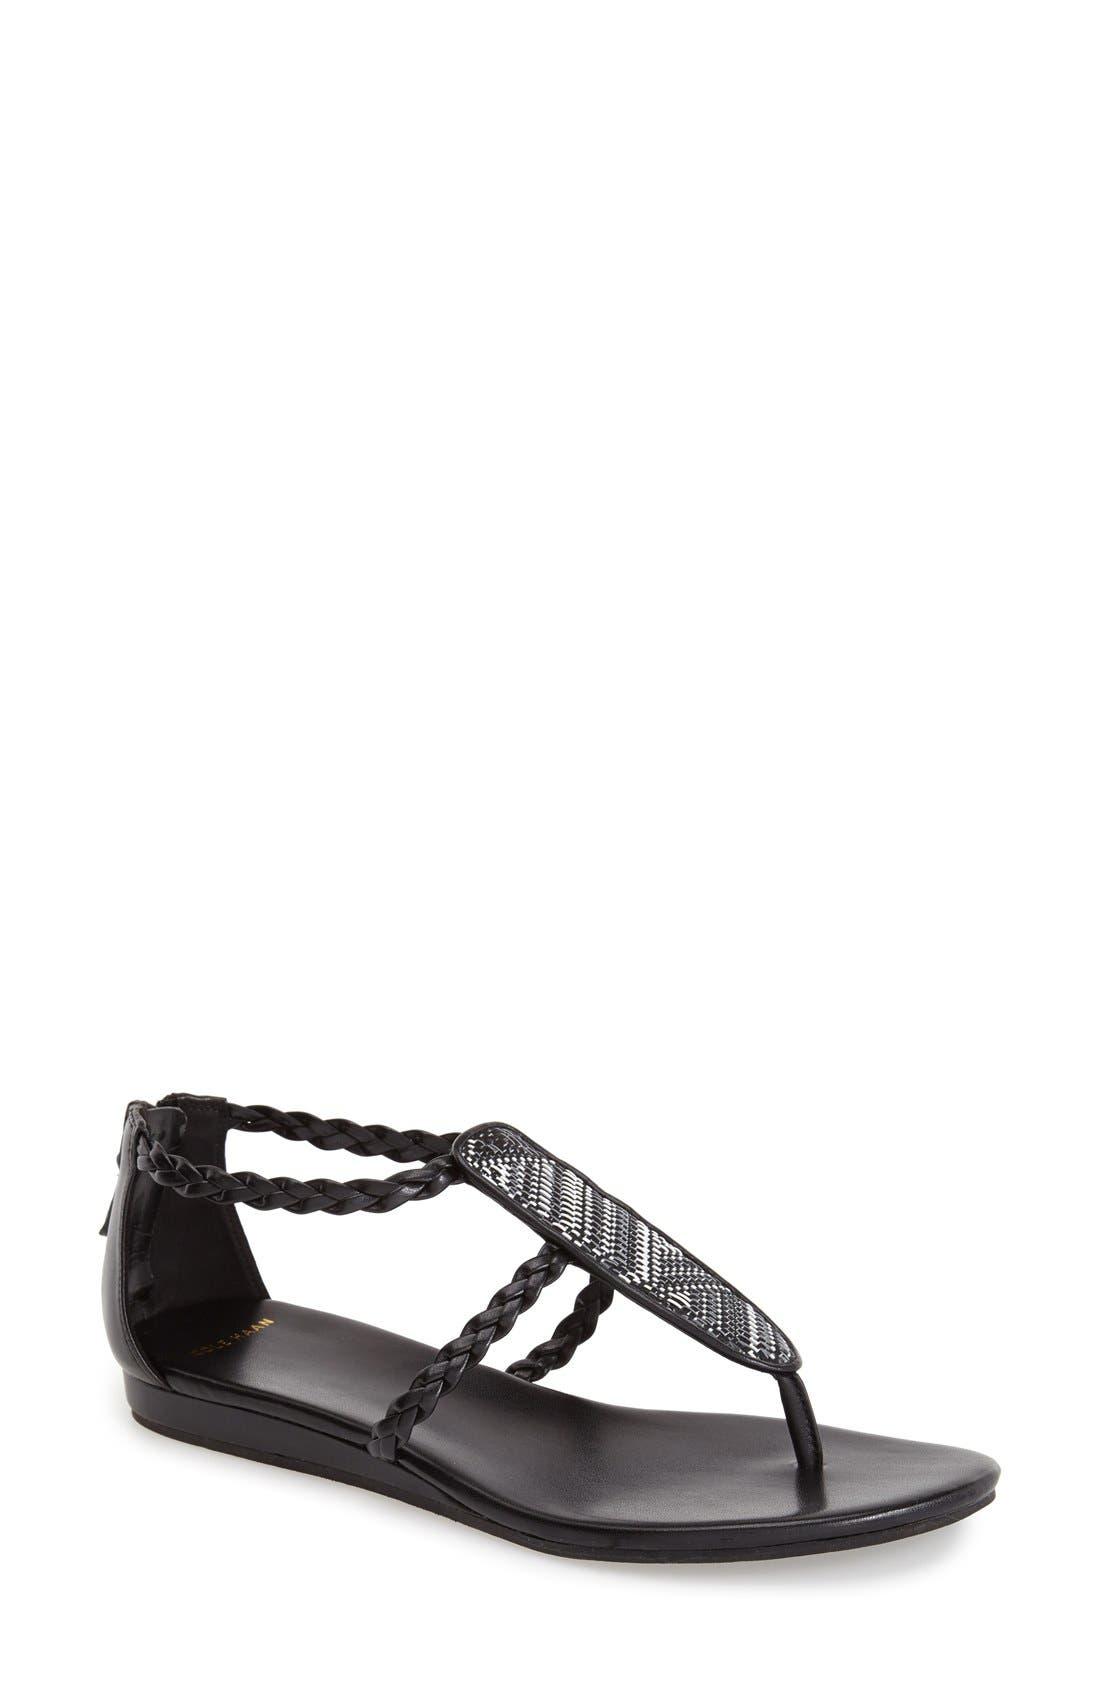 'Abbe' Sandal,                         Main,                         color, 001